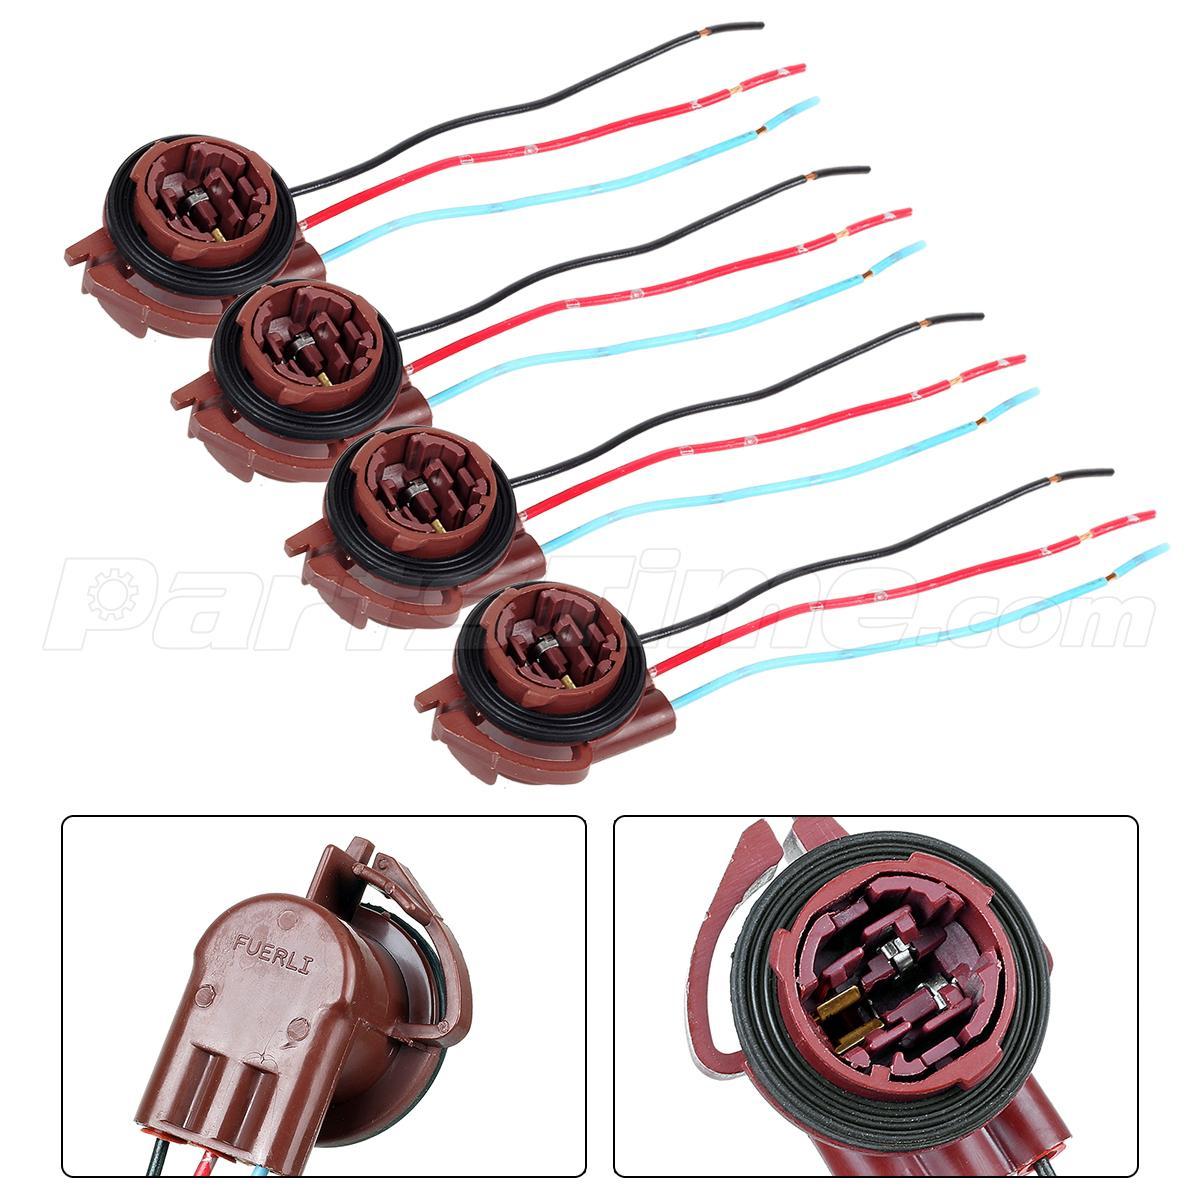 4x 3157 3057 3156 4157 turn signal brake light female ATV Wiring Harness Throttle Cable Hanmar9 ATV 110Cc Starter Wiring Harness